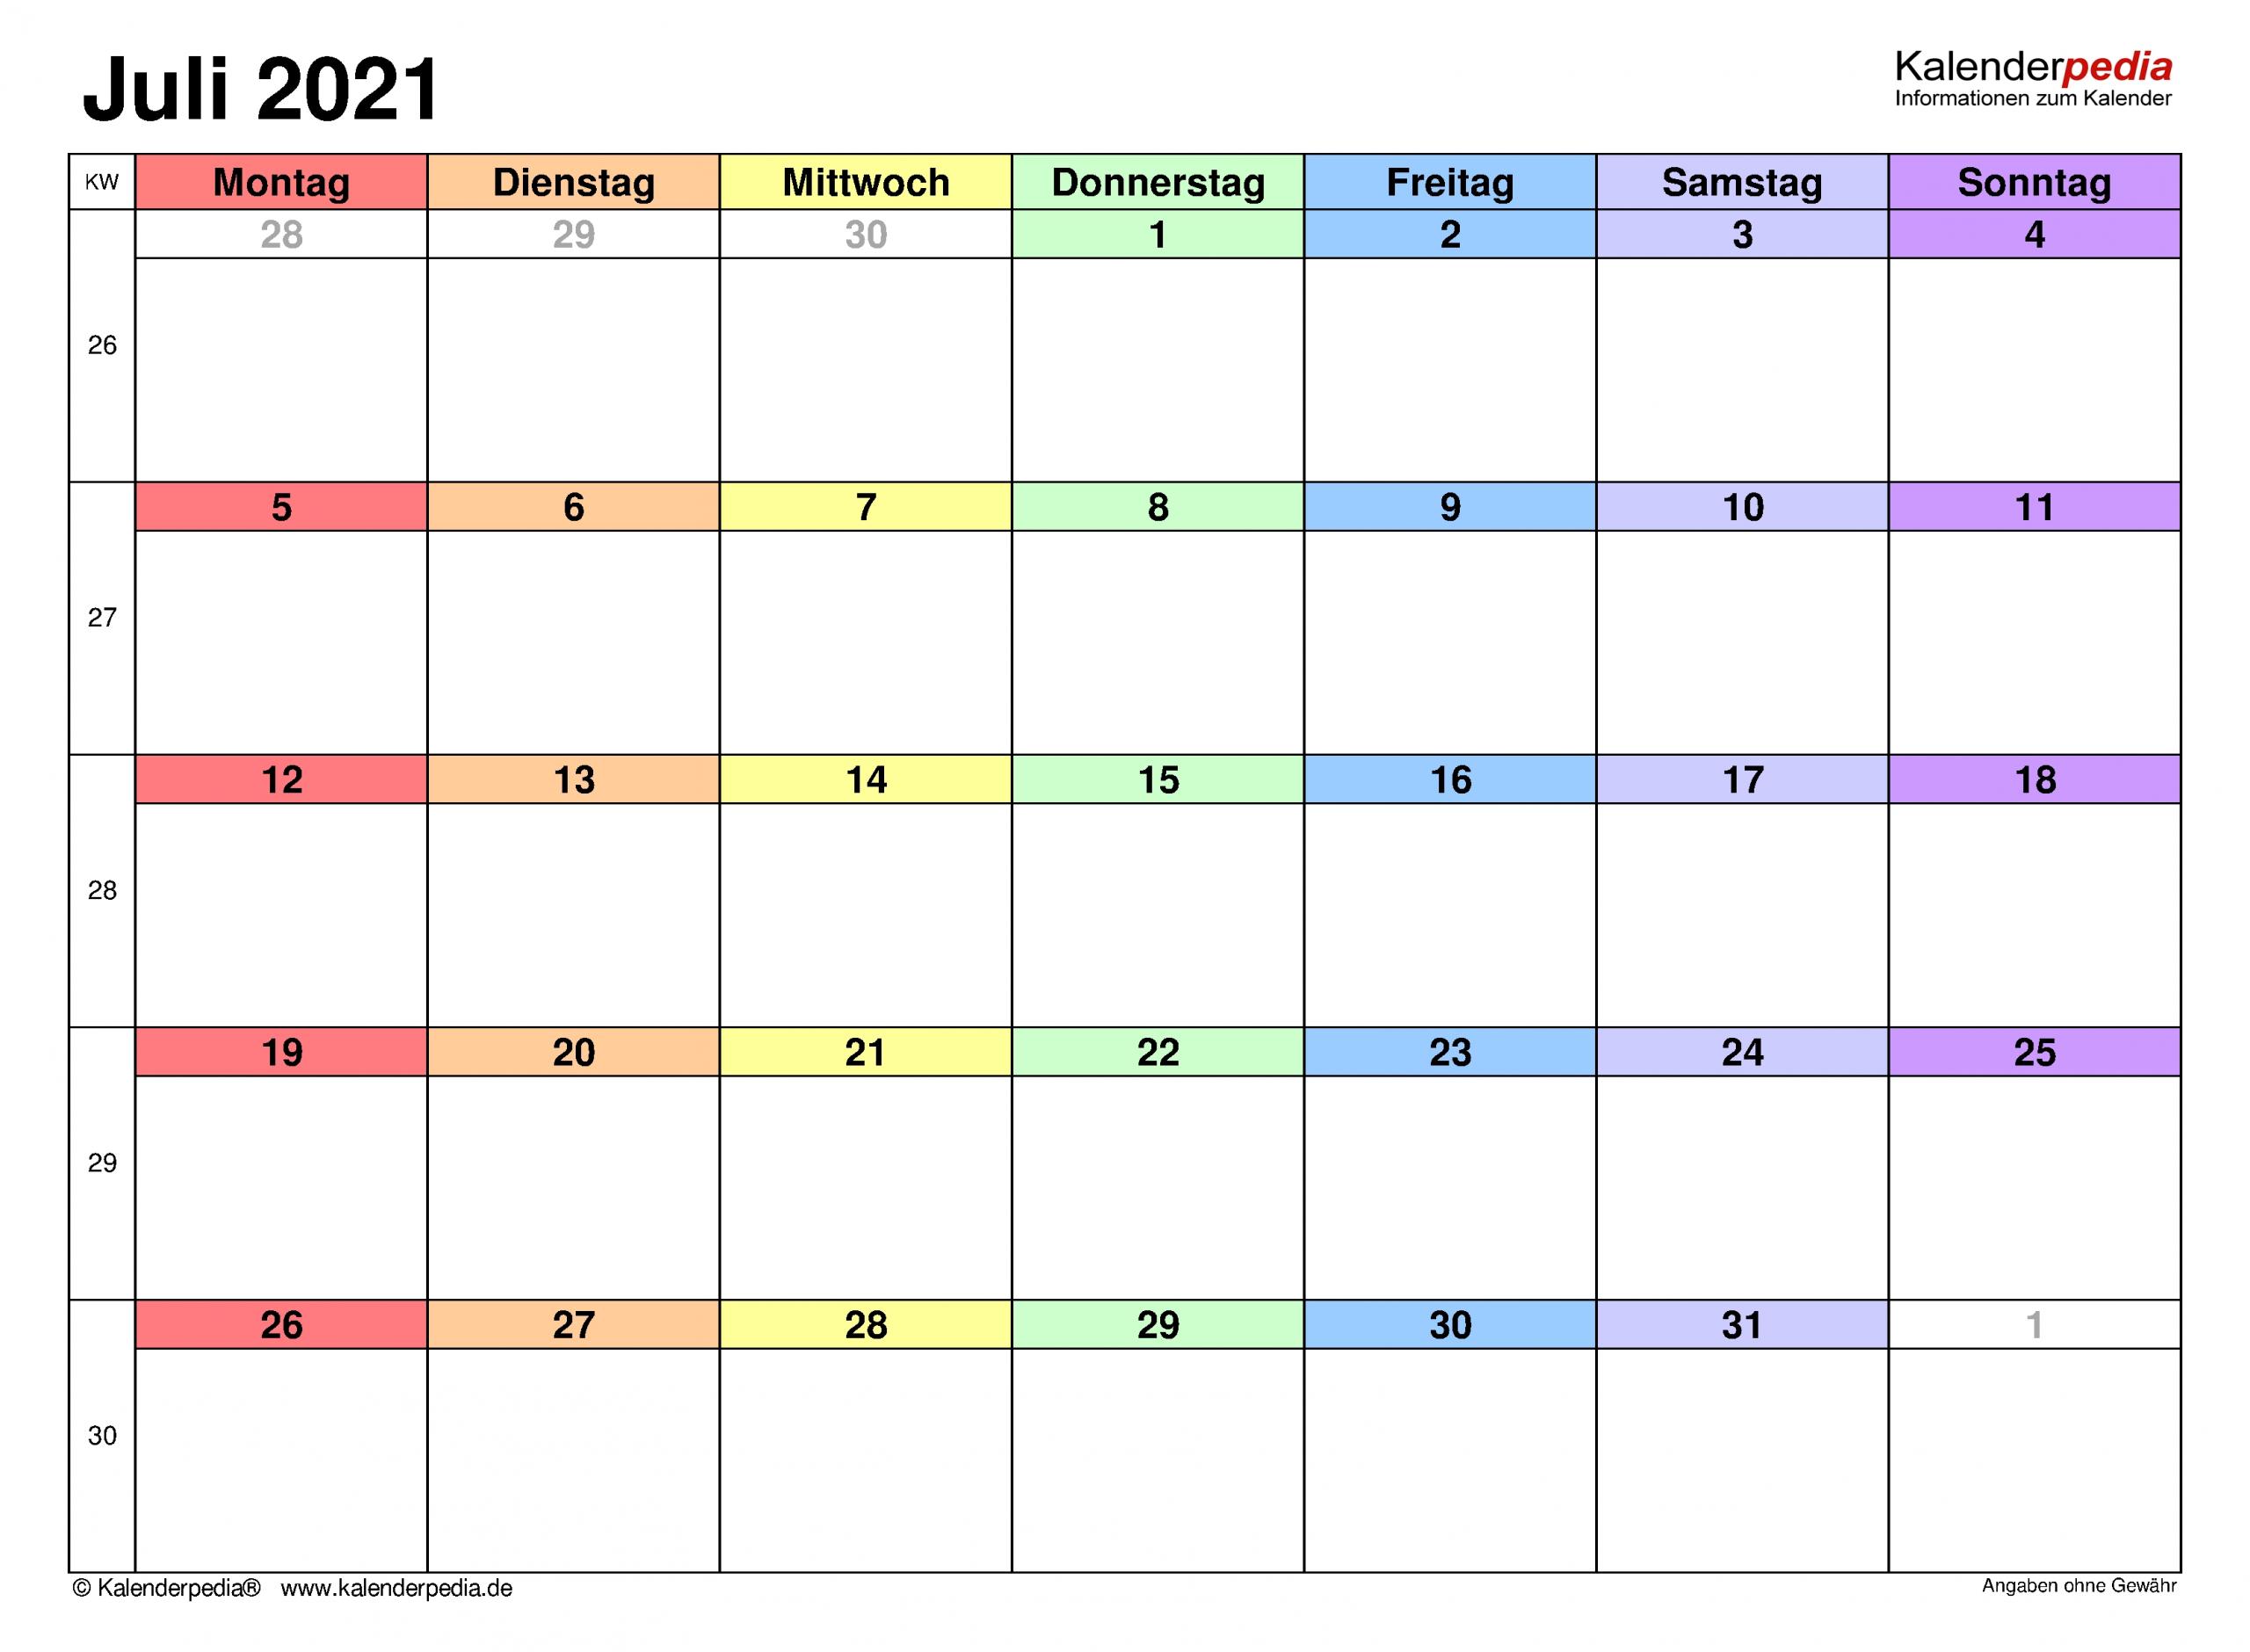 Collect Juli 2021 Kalender